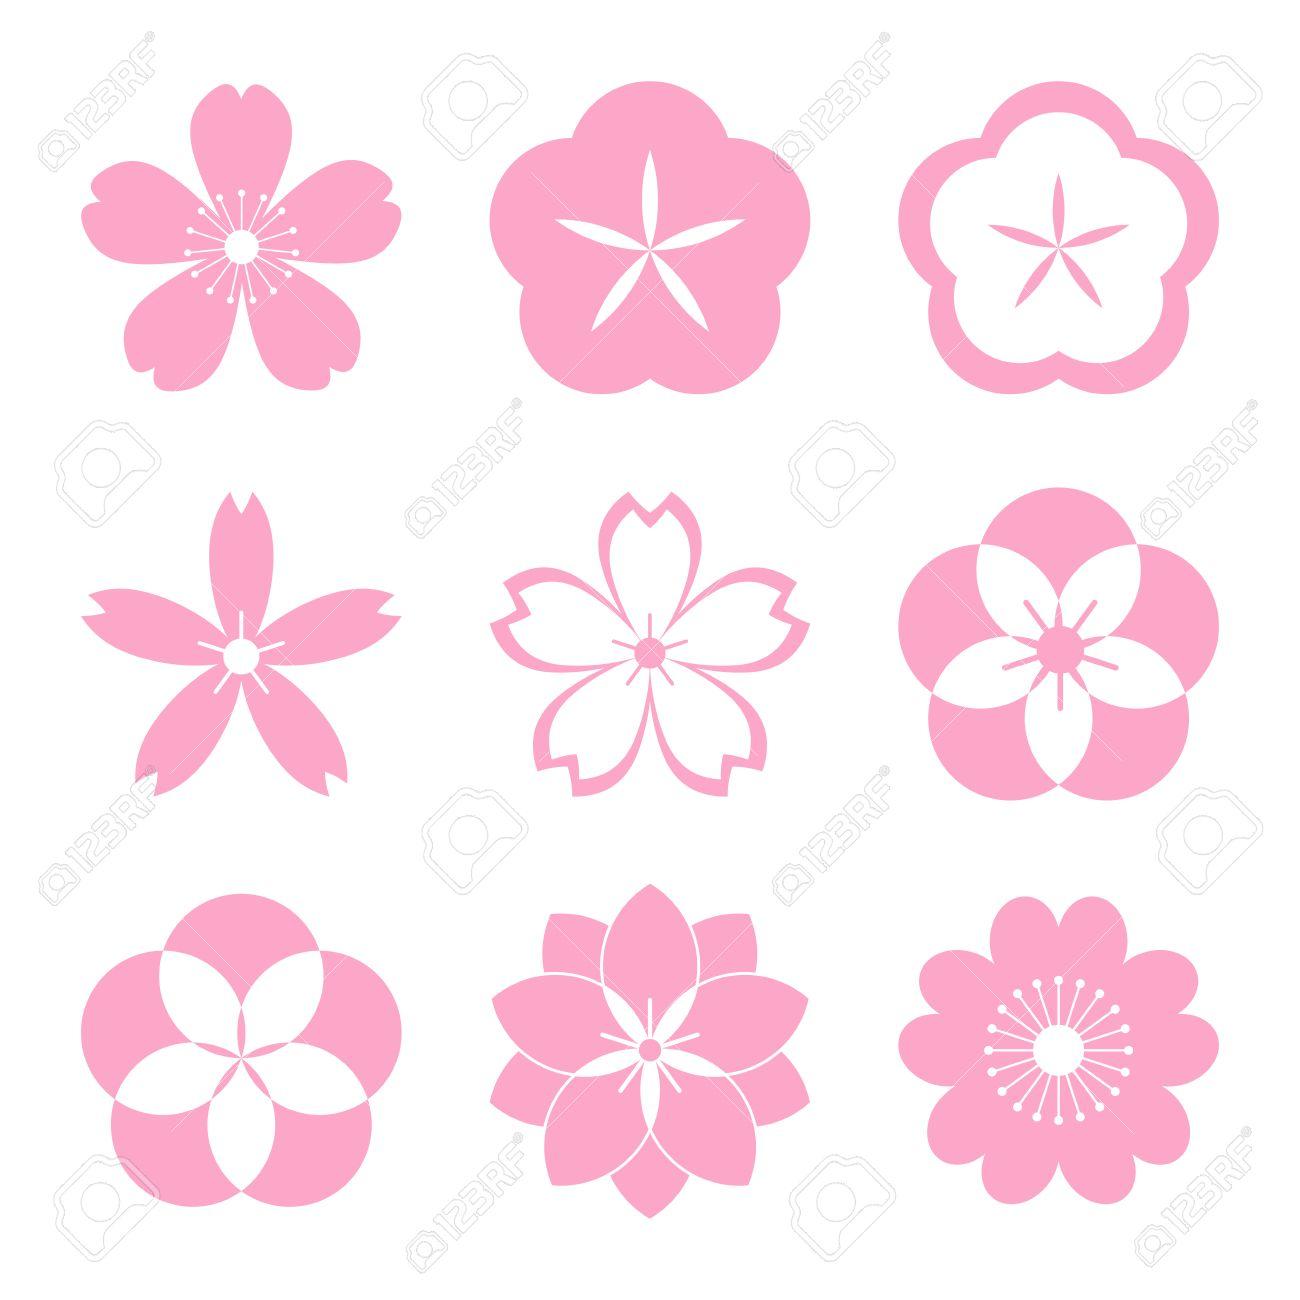 cherry blossom icon set sakura icon set all in a single layer rh 123rf com Pink Cherry Blossom Tree Cherry Blossom Clip Art Black and White